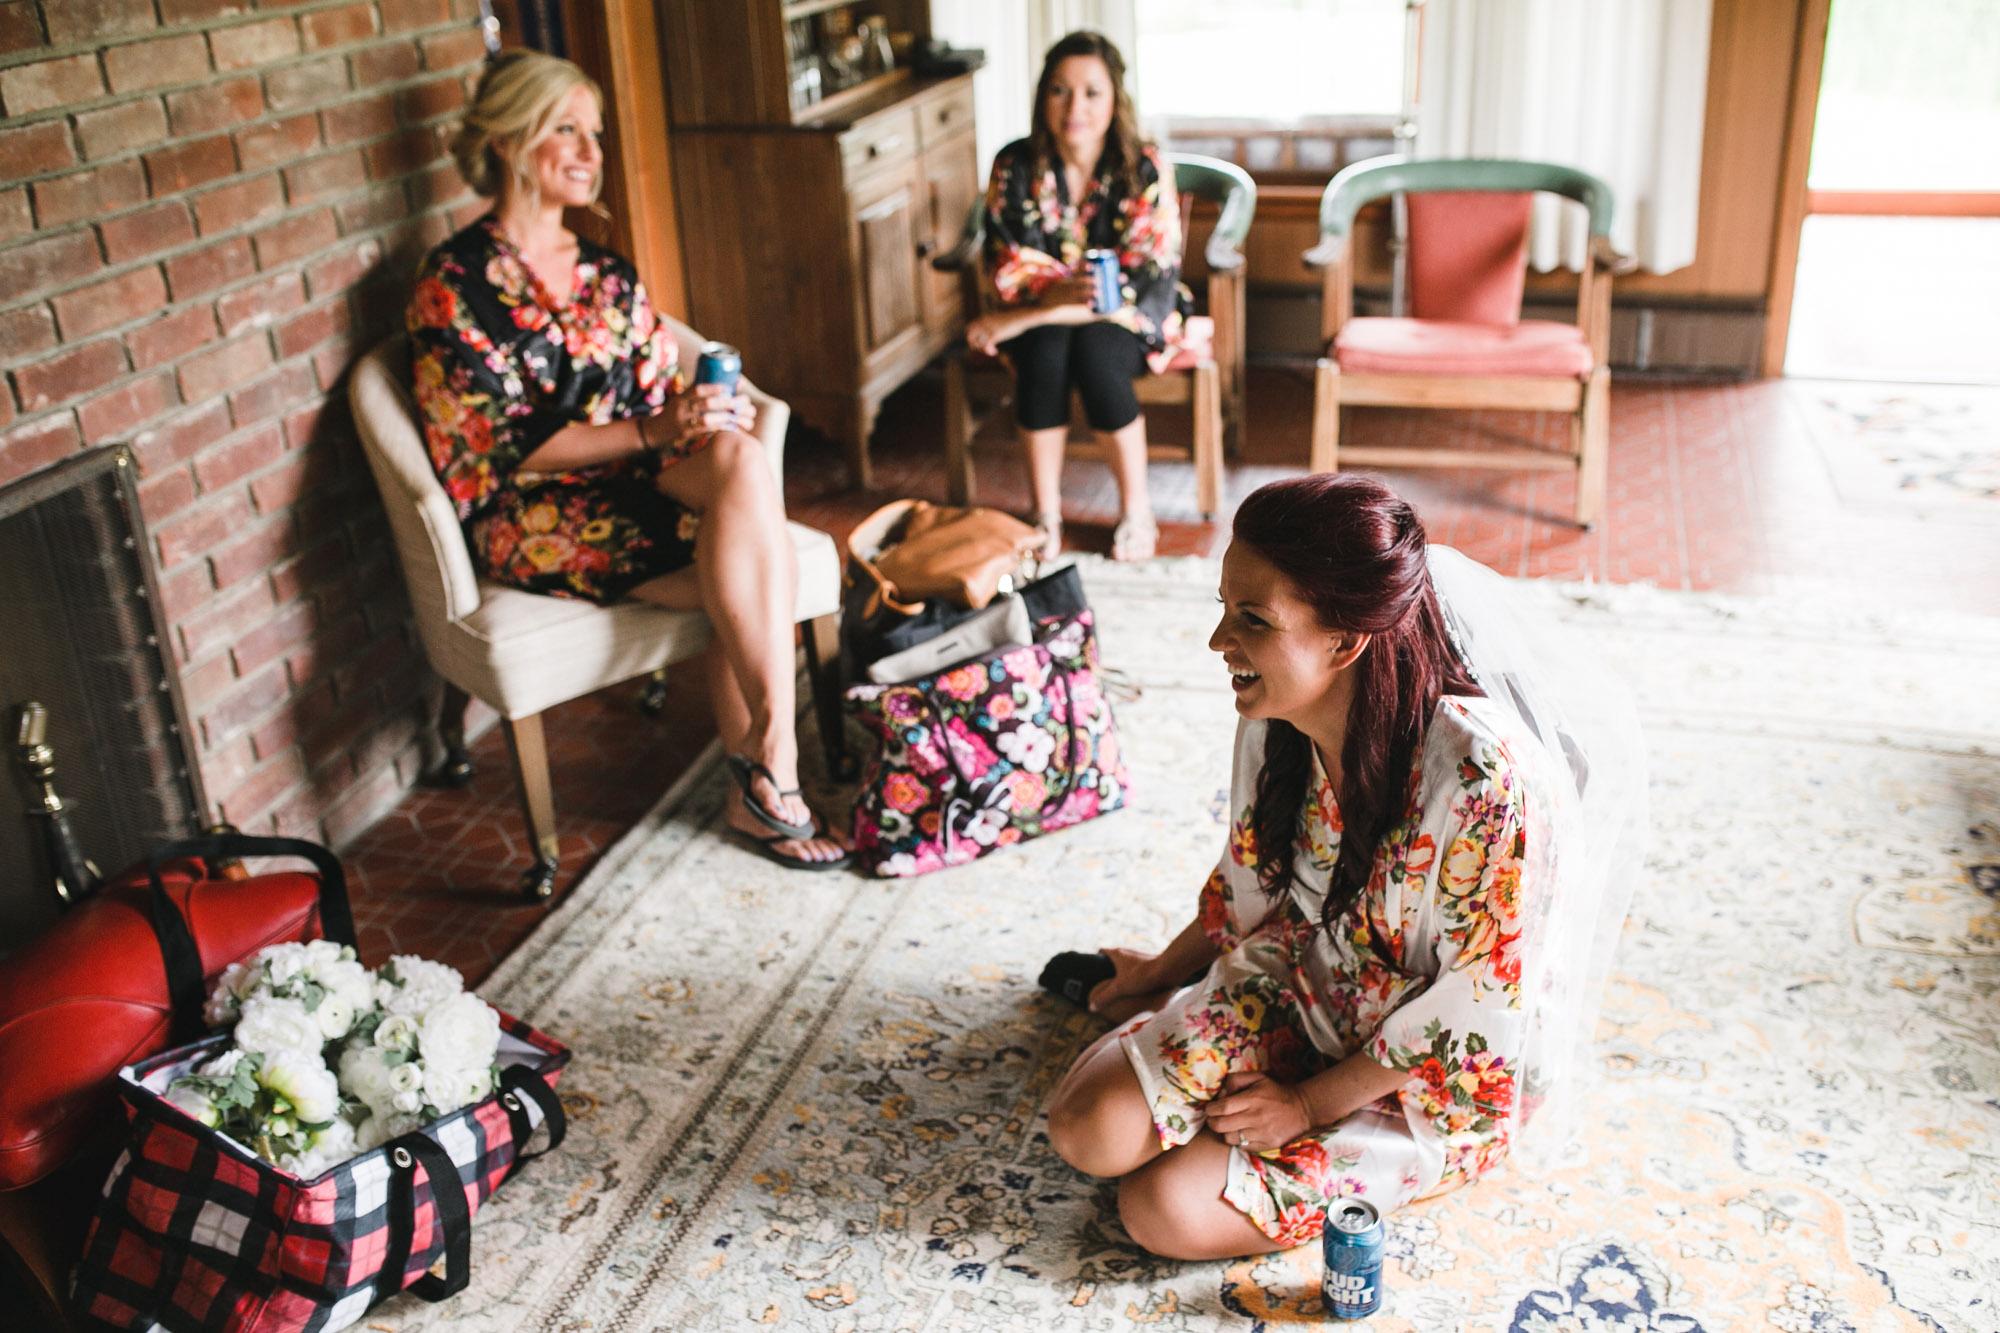 hensville-armory-wedding (1 of 8).jpg